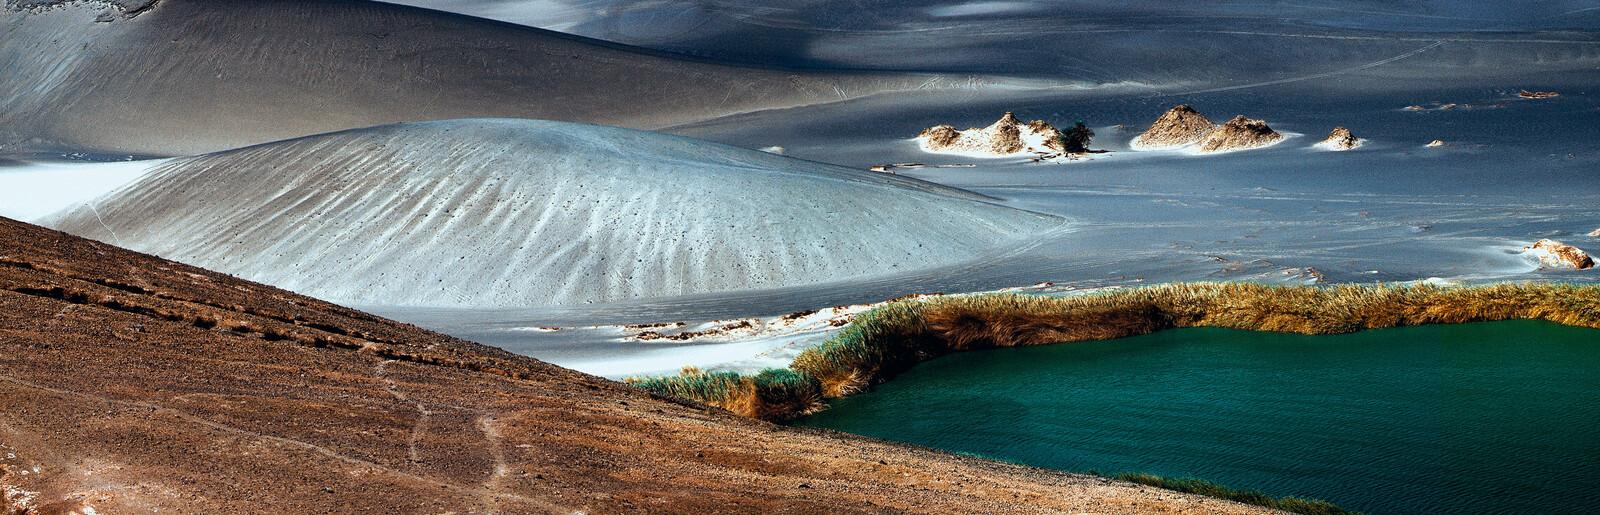 Wau an Namus / Libya I - Hans Gasser